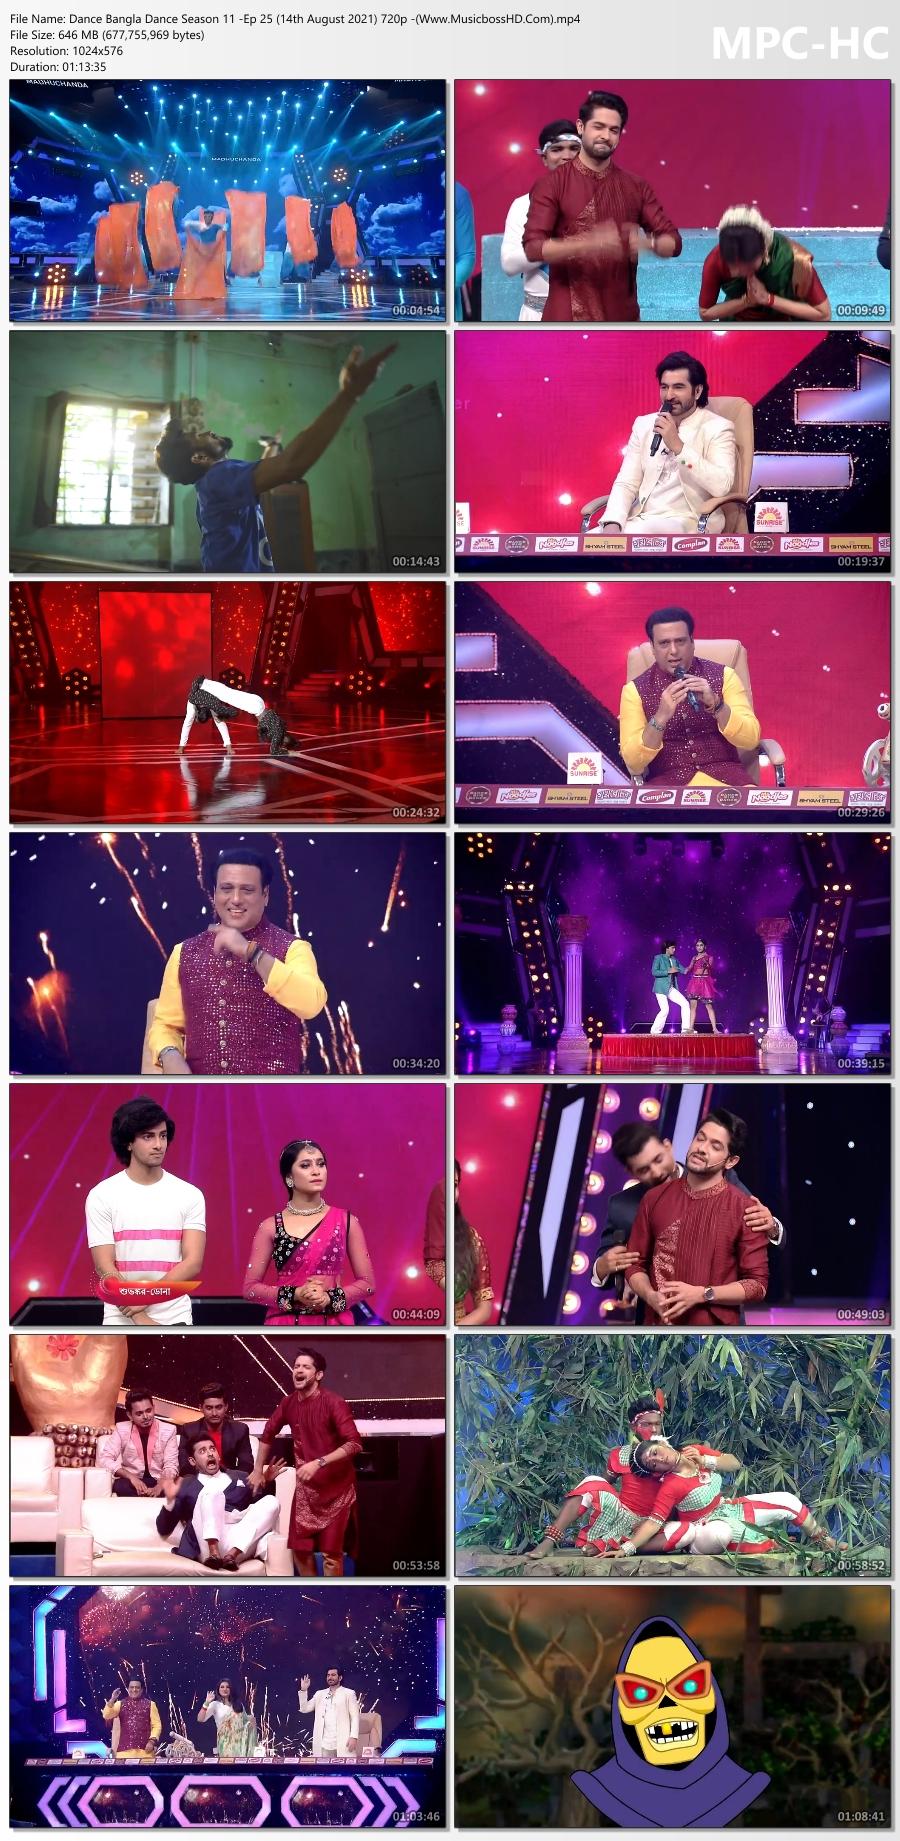 Dance-Bangla-Dance-Season-11-Ep-25-14th-August-2021-720p-Www-Musicboss-HD-Com-mp4-thumbs